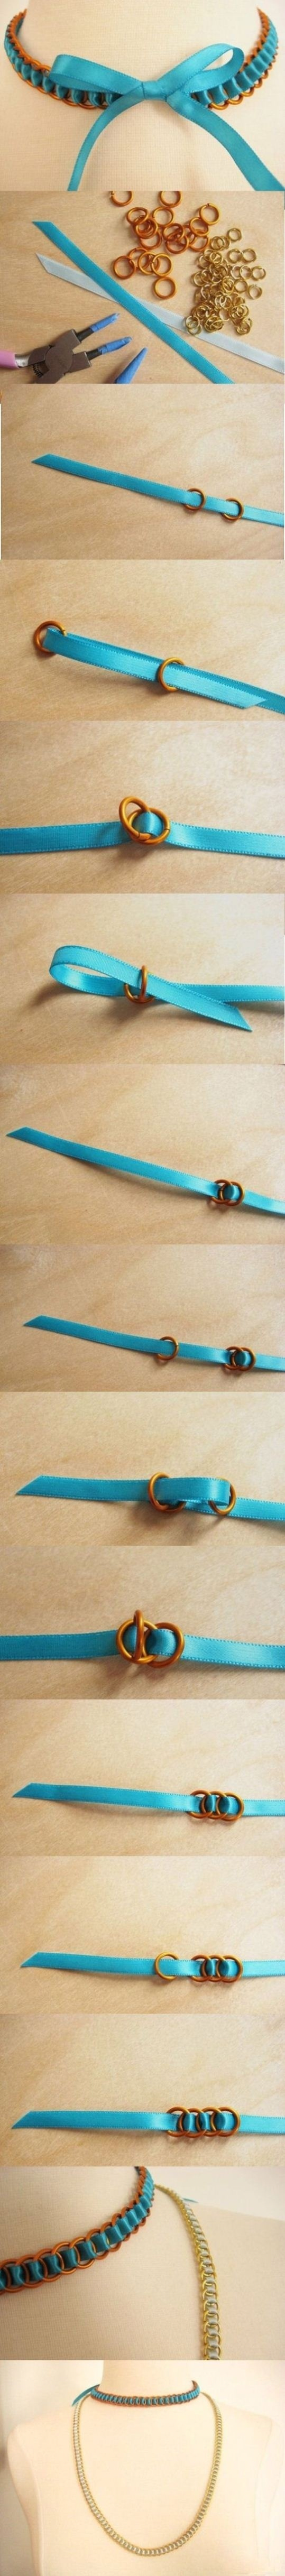 DIY Fashion Necklace | CutePinky SocialBookmarking